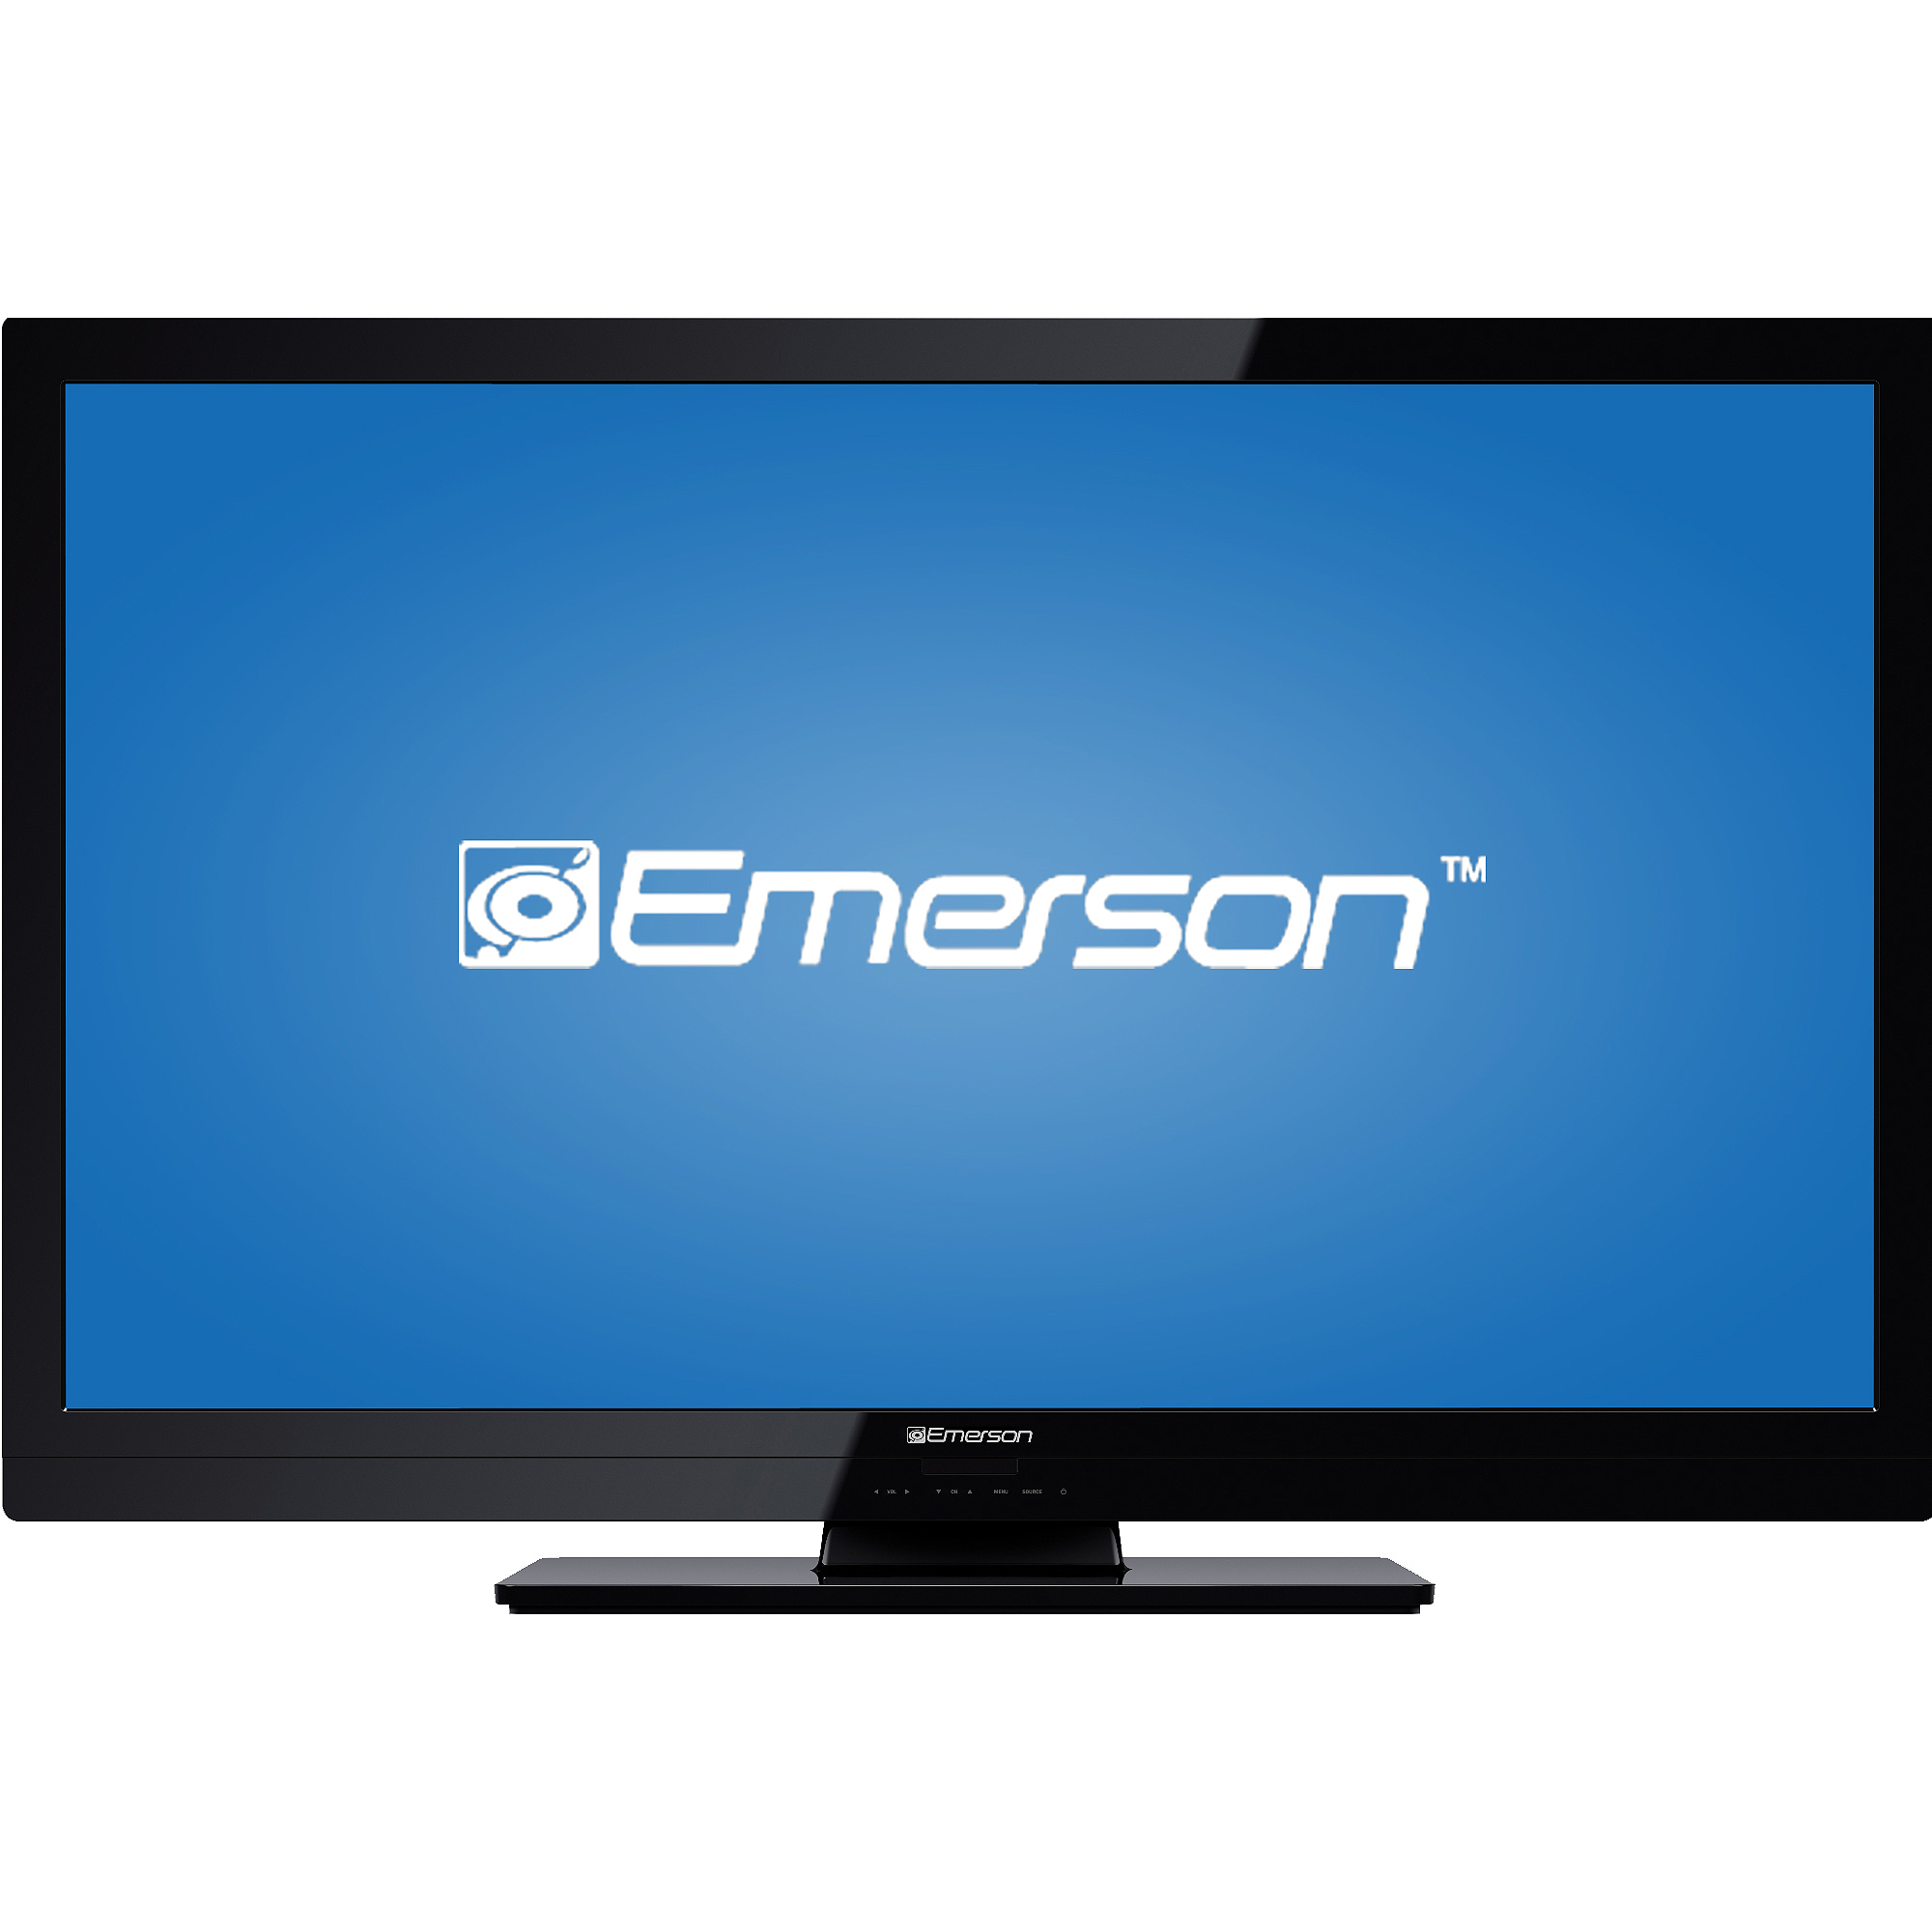 Emerson 39 Quot Class Lcd 1080p 60hz Hdtv Lc391em3 Walmart Com